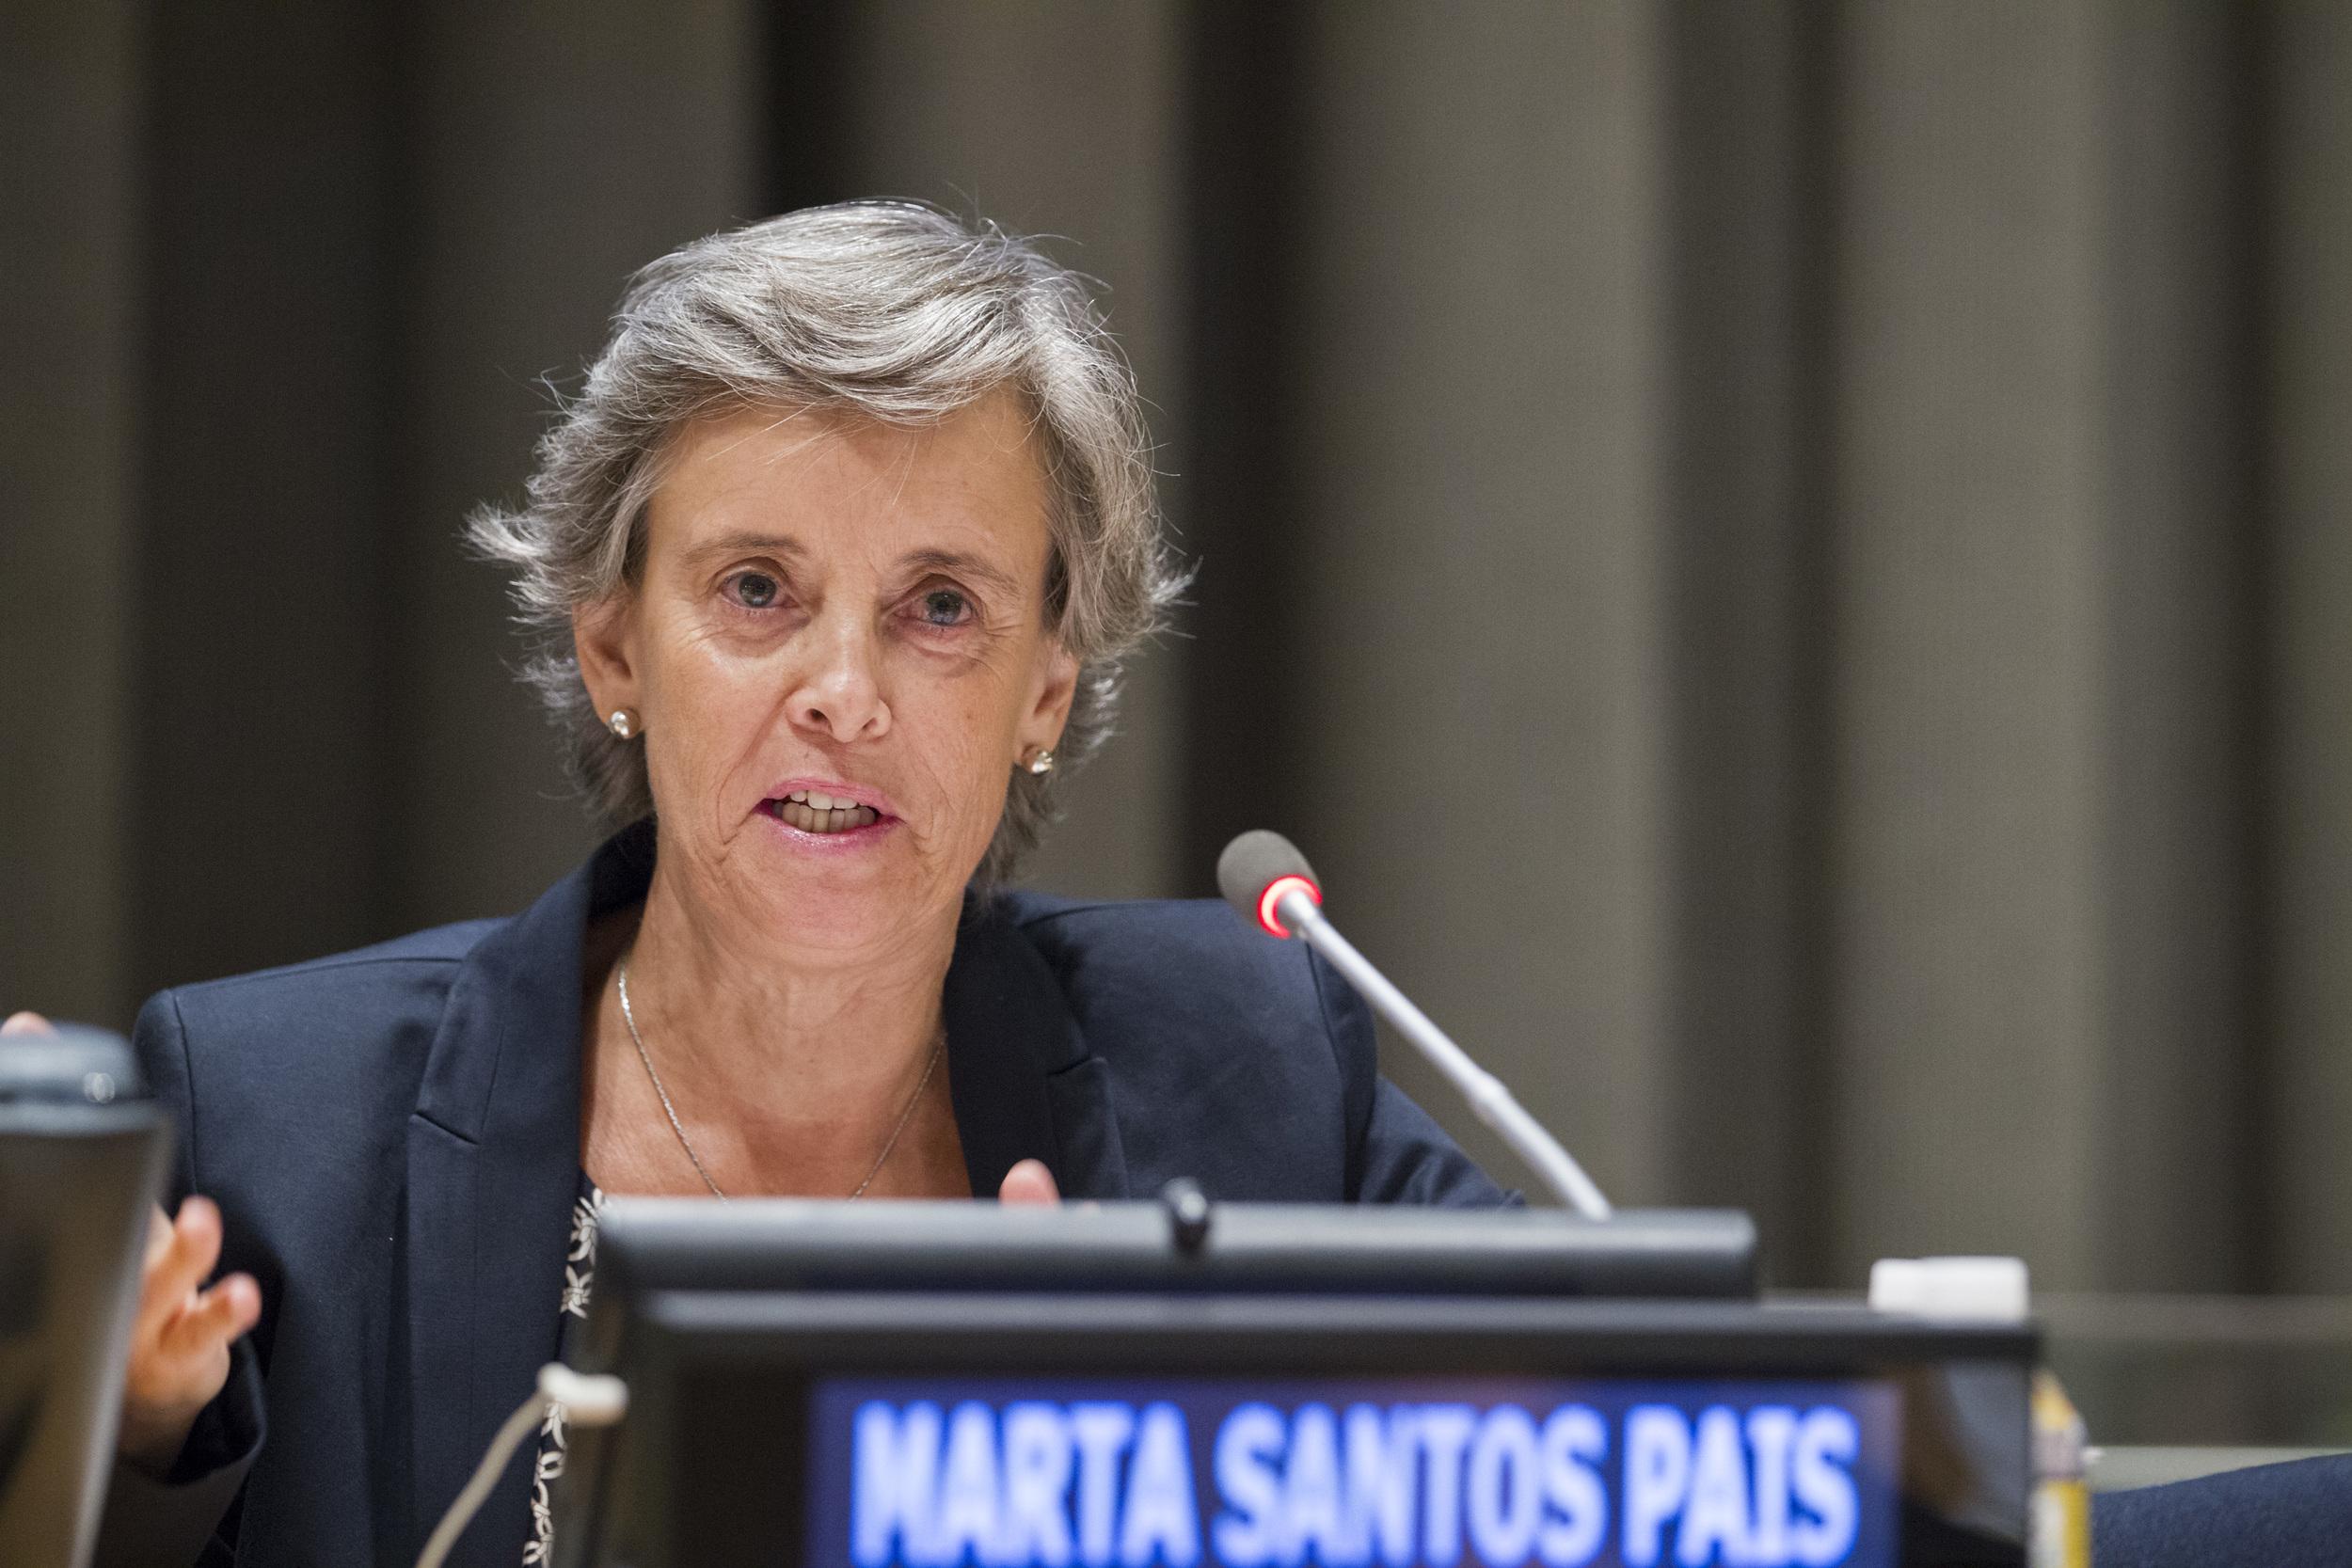 Marta Santos Pais